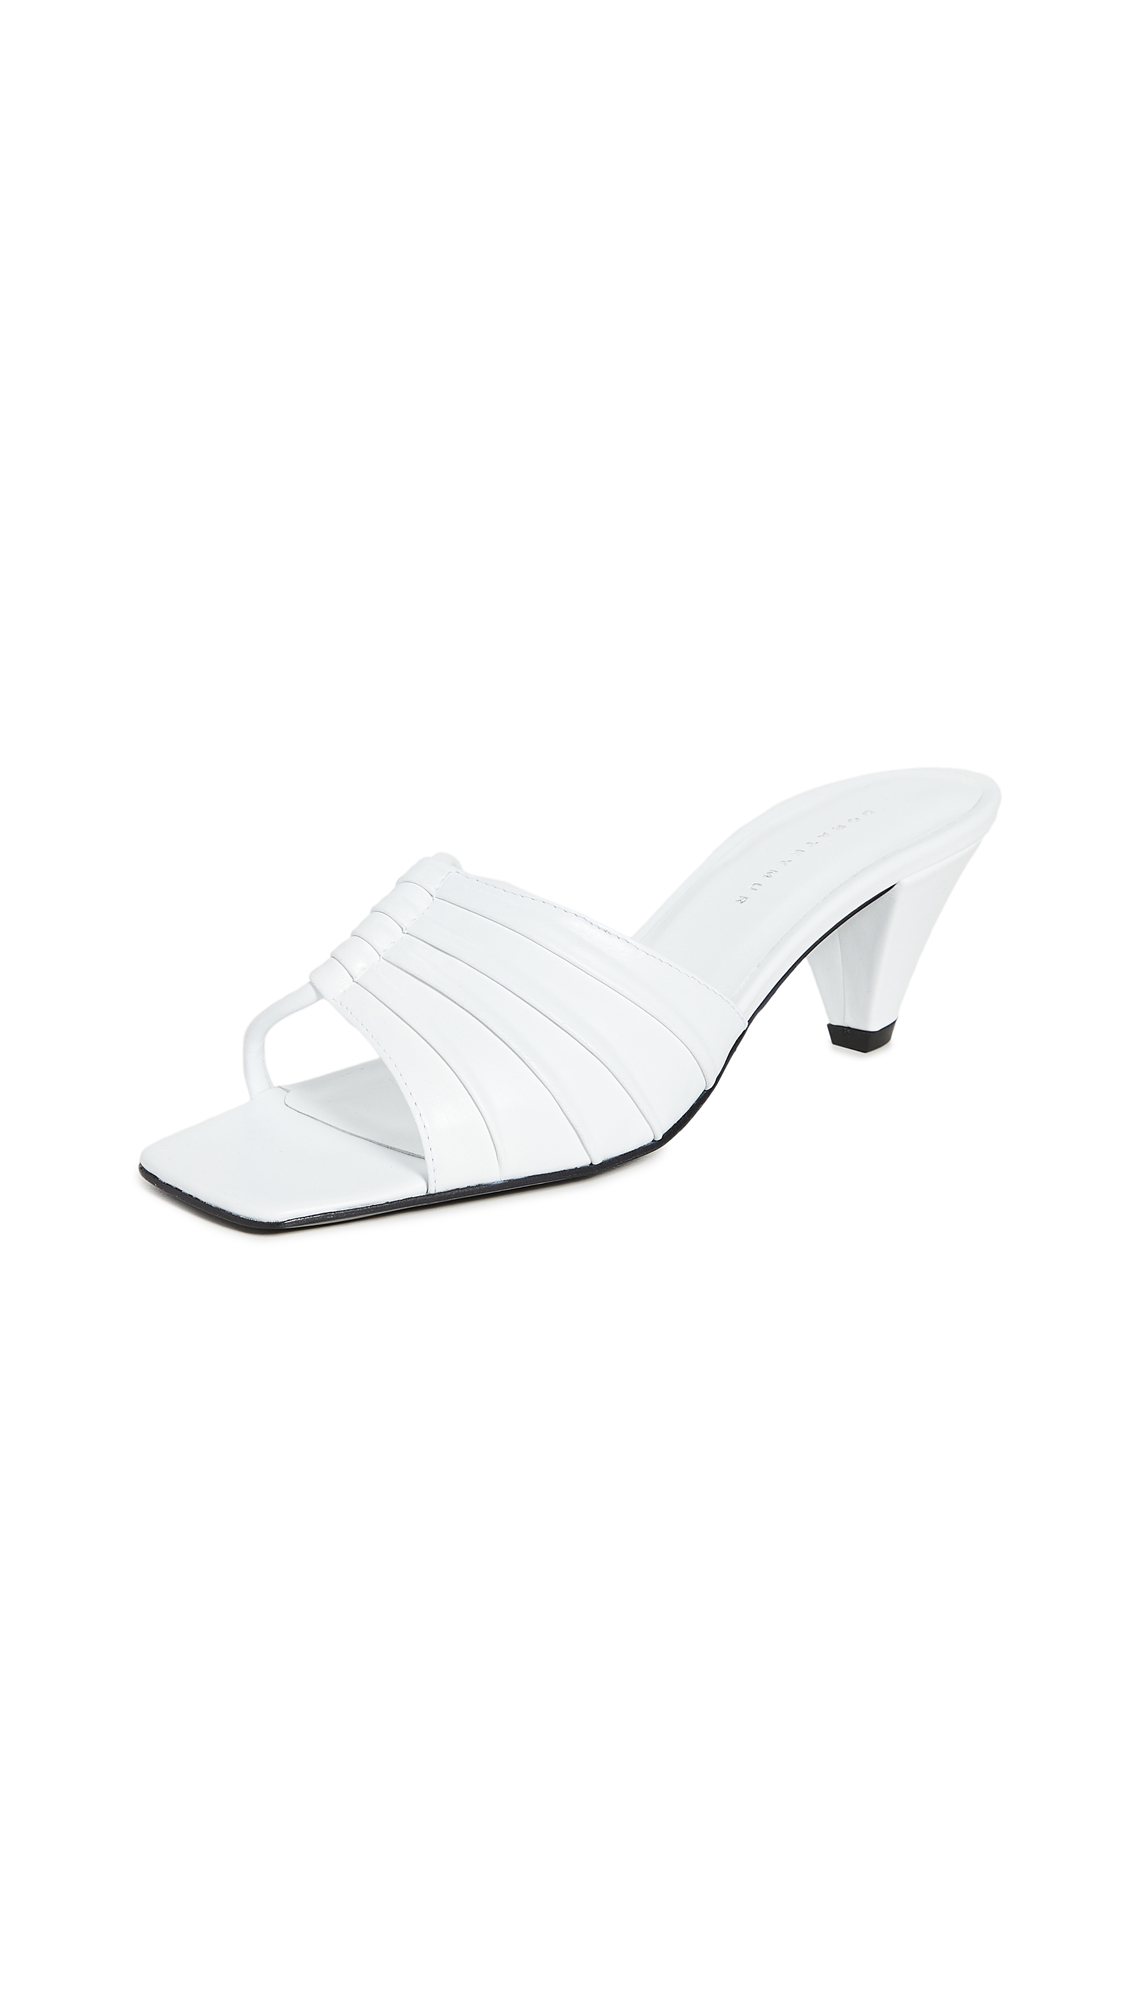 Dorateymur 103 Sandals - 50% Off Sale